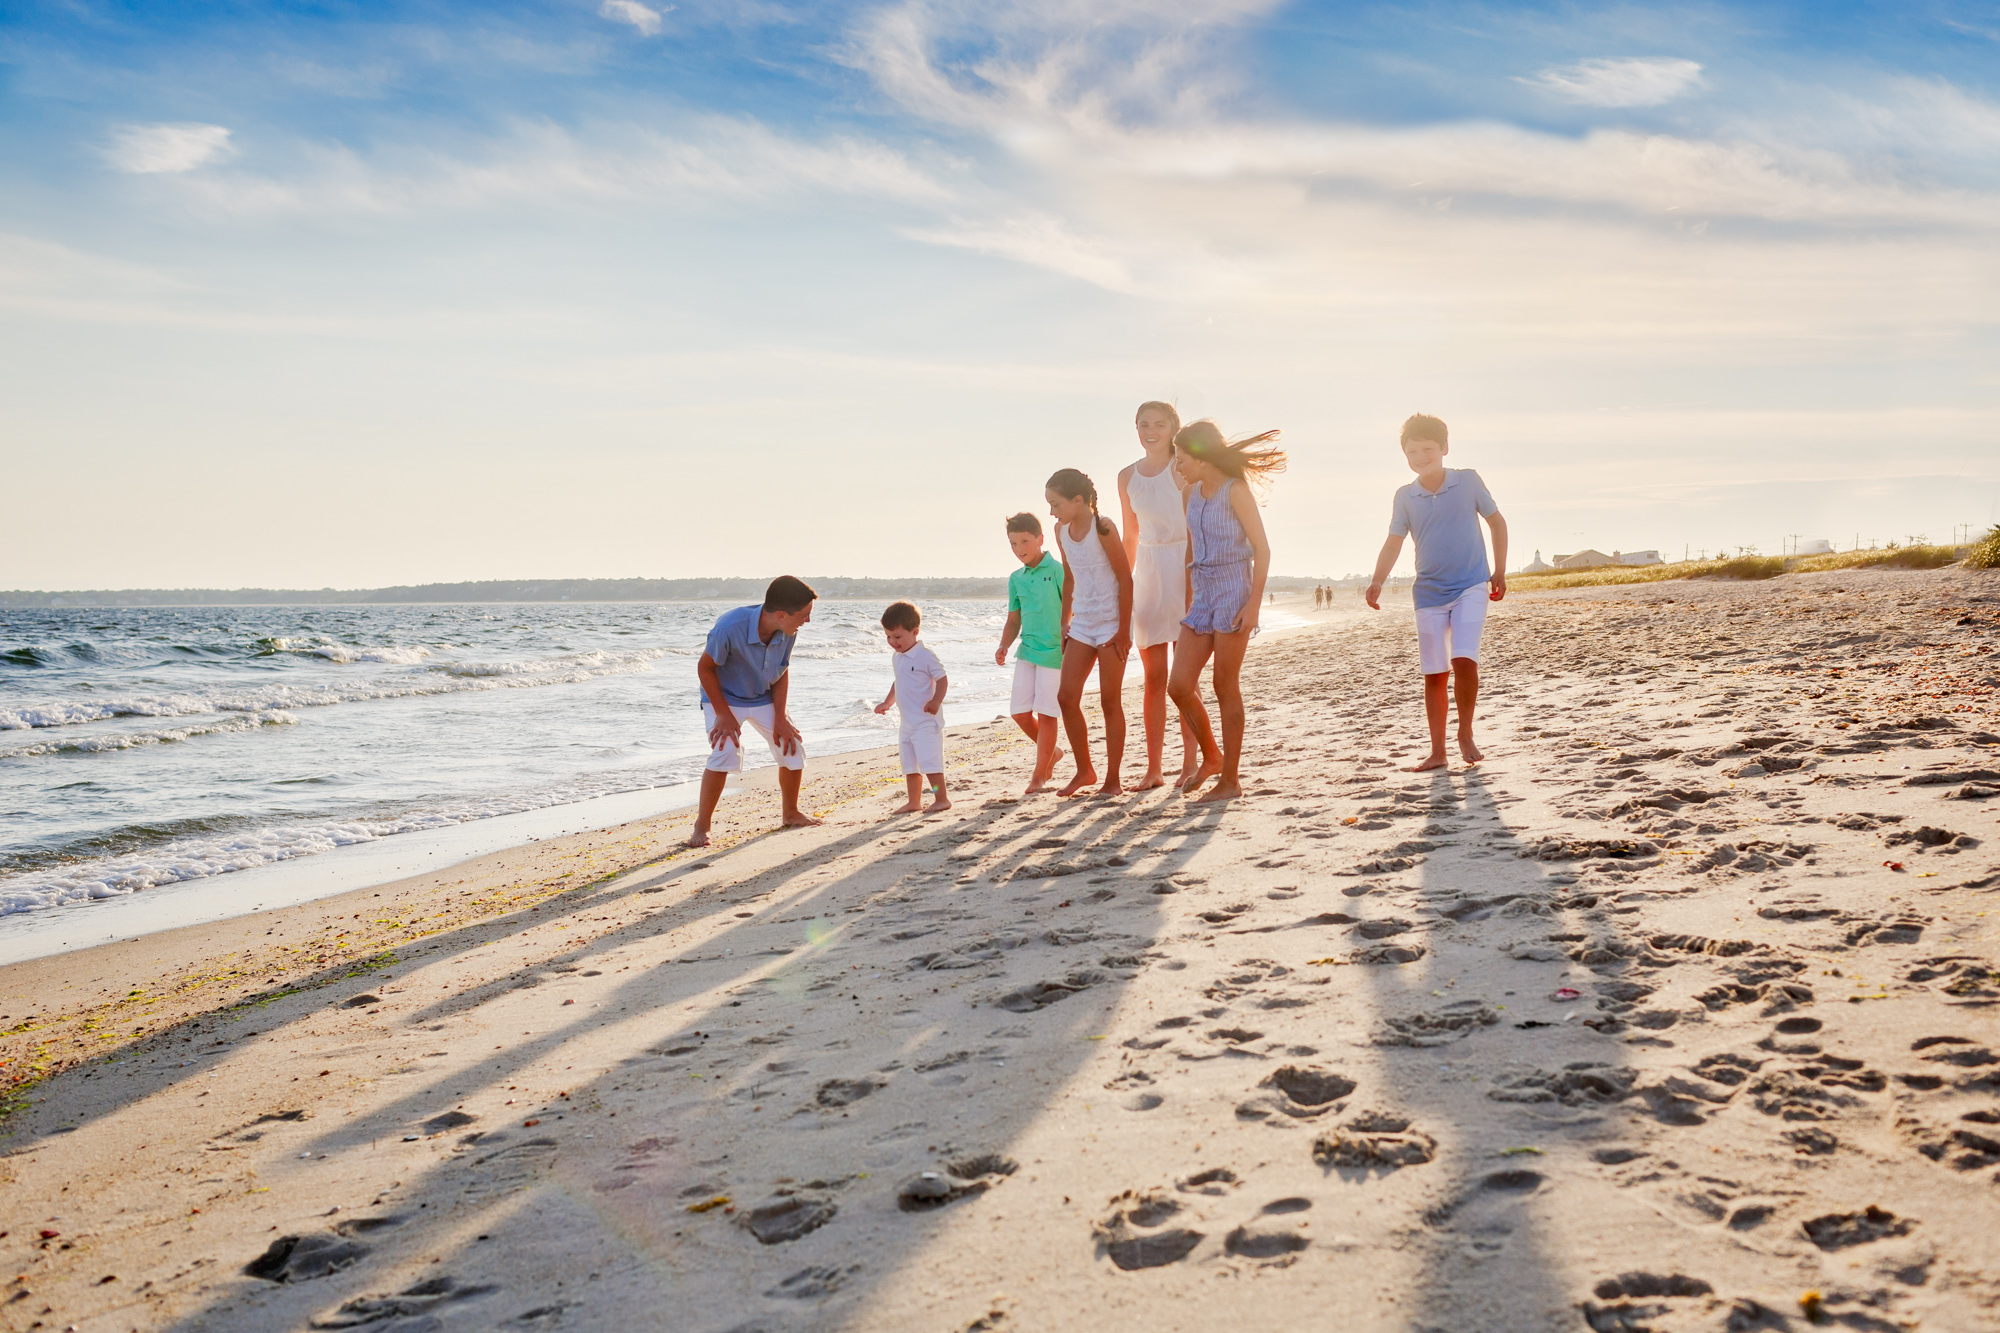 cousins on beach at golden hour